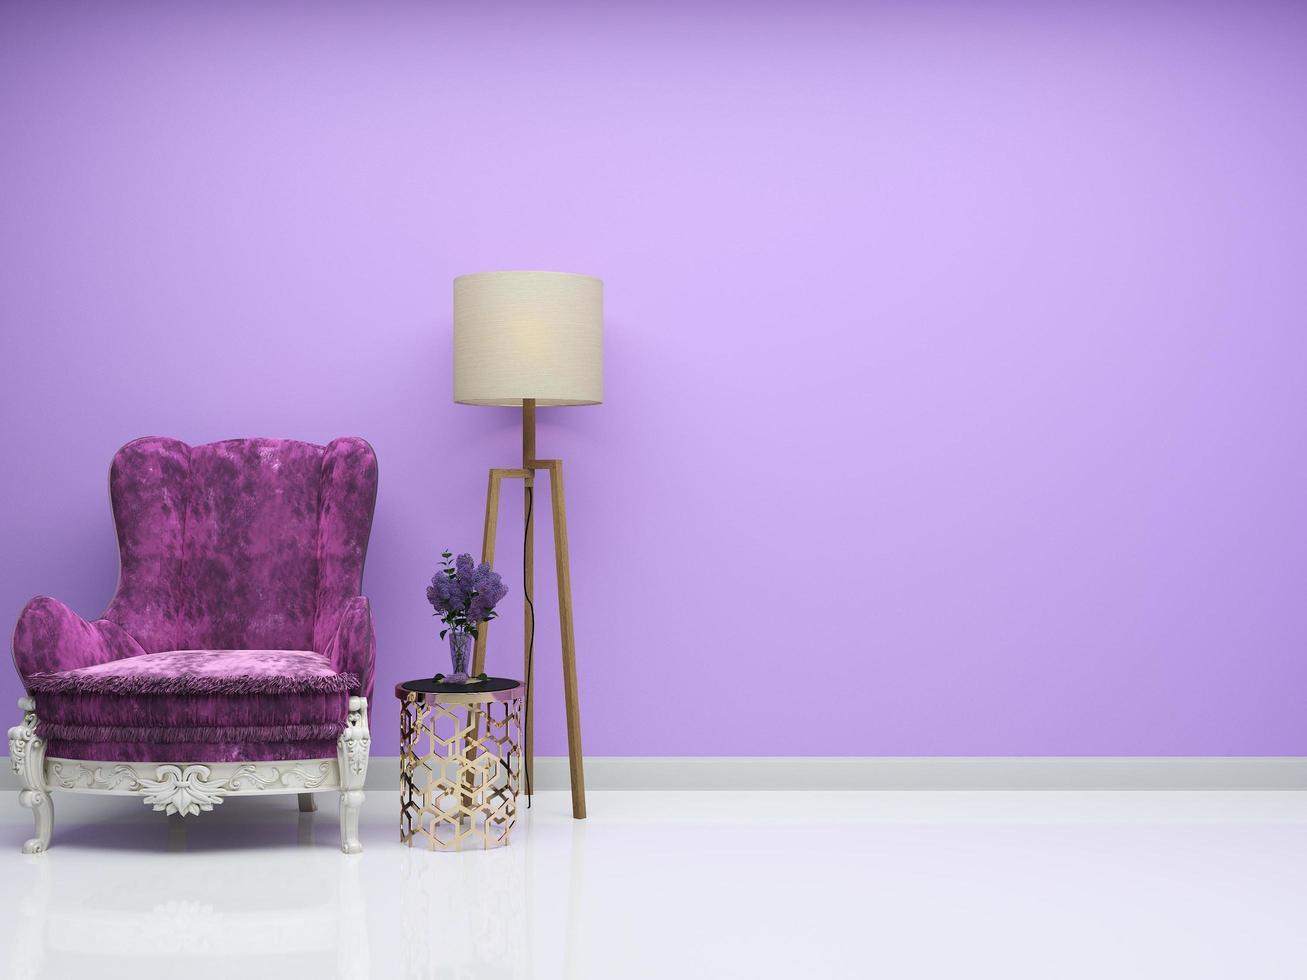 sala de estar púrpura foto